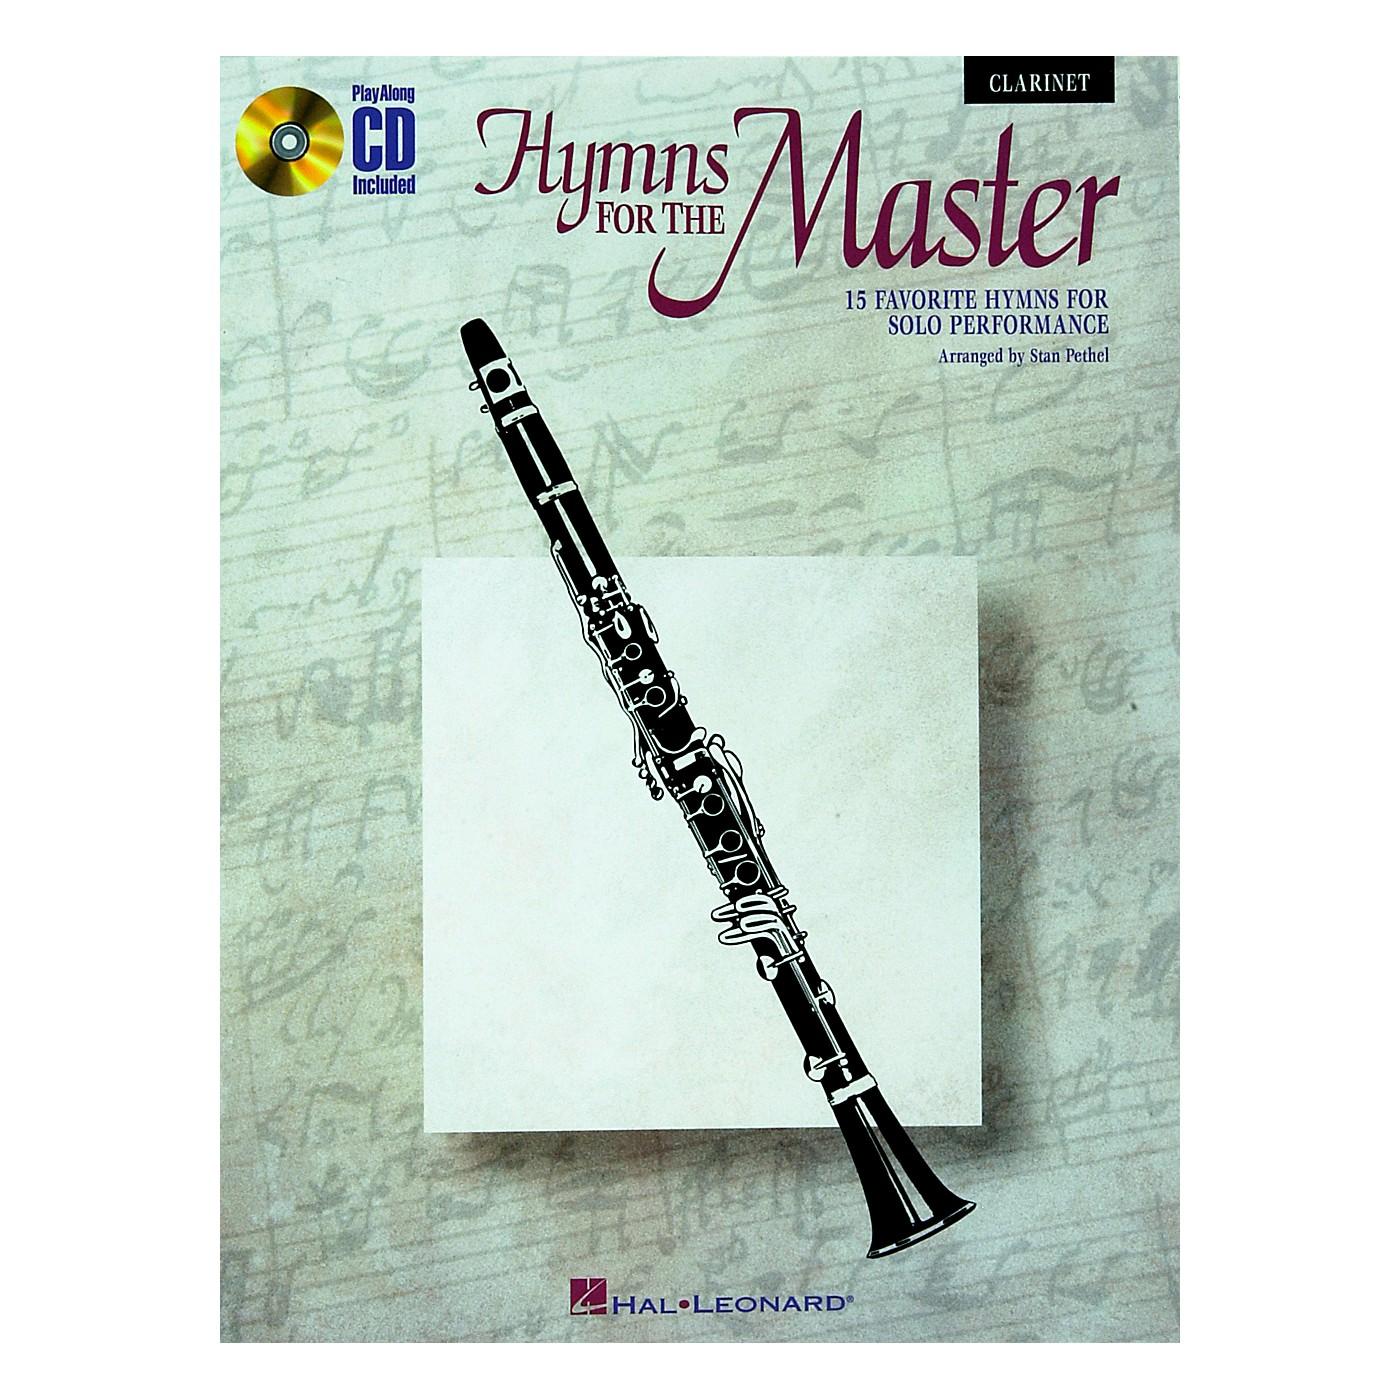 Hal Leonard Play Along Hymns for The Master (Book/CD) thumbnail